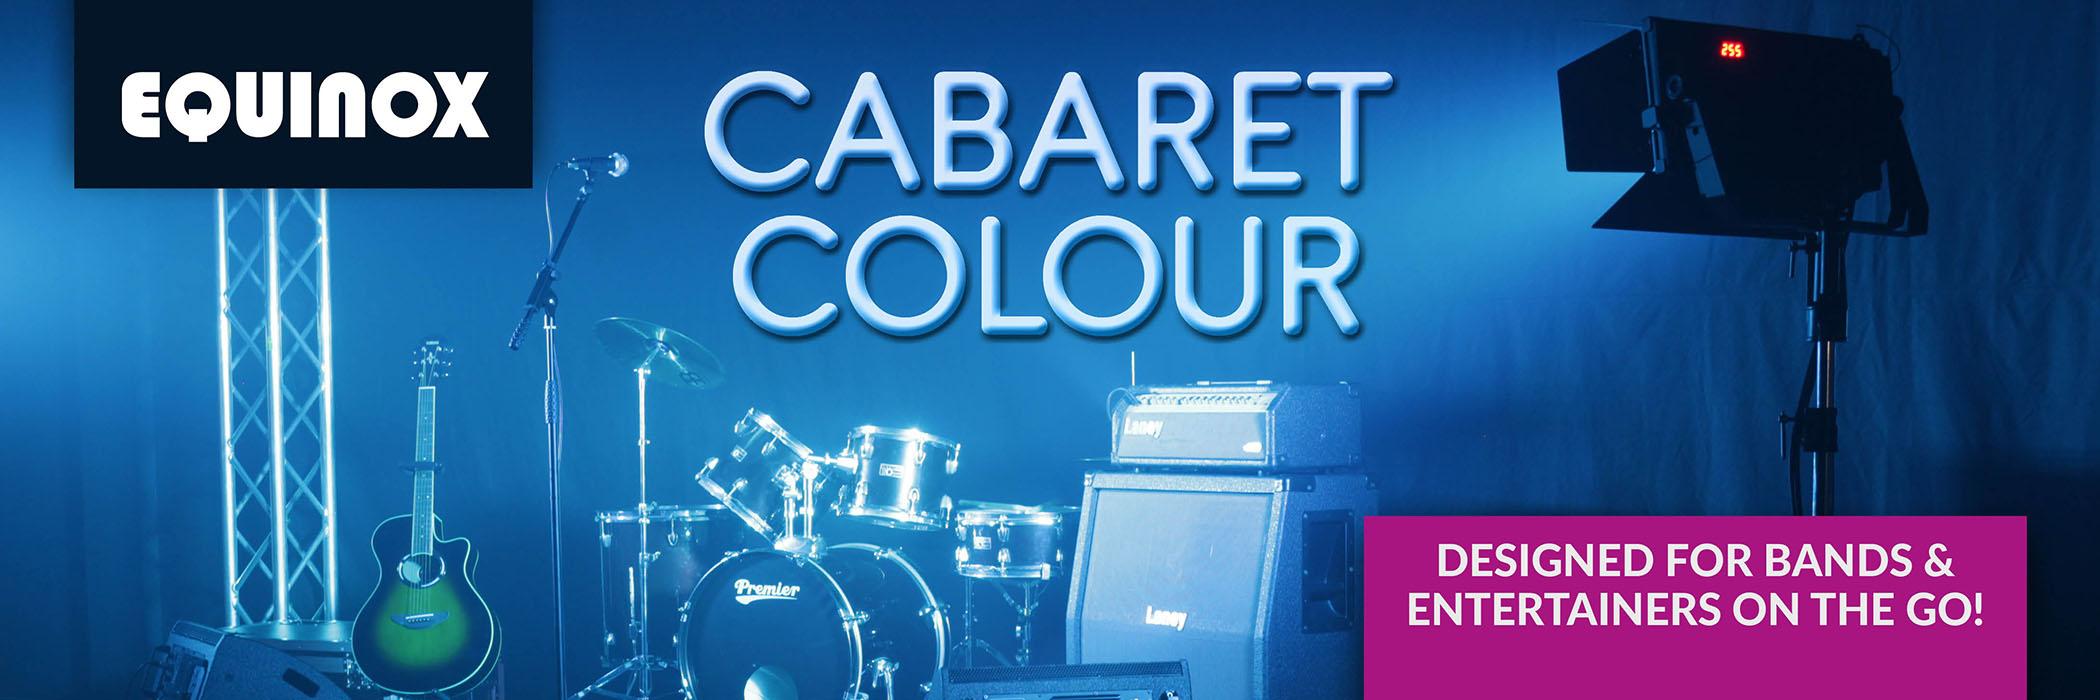 Cabaret New In Banner